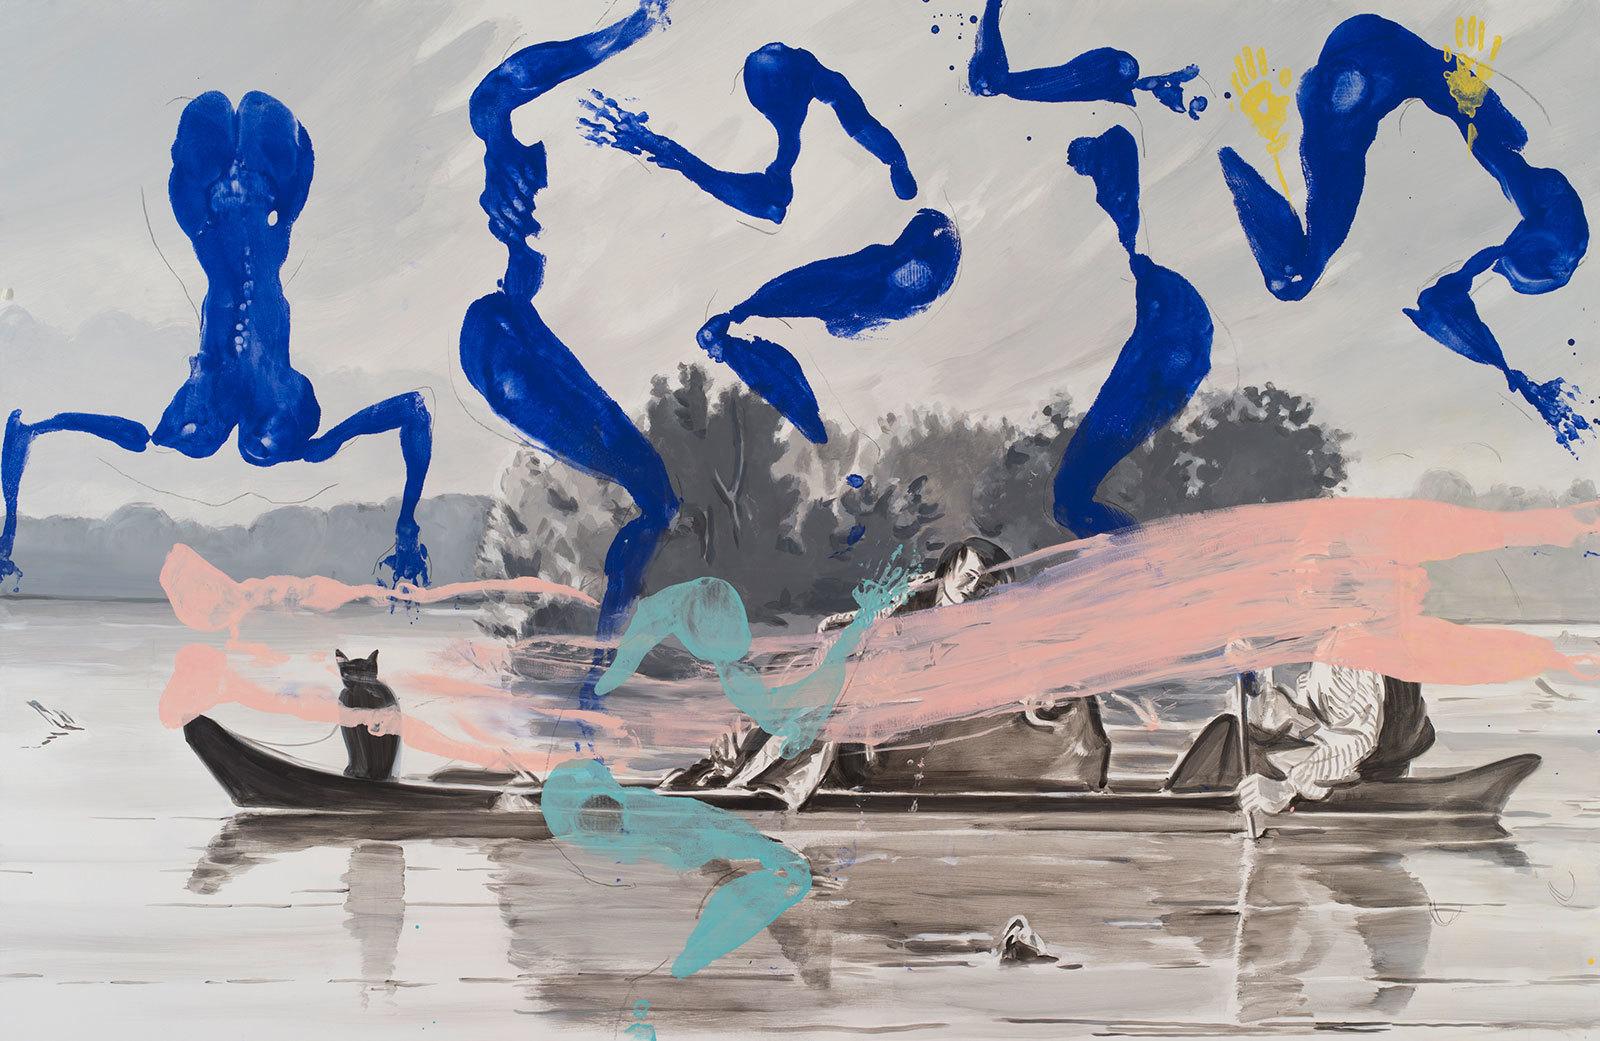 Maureen-Paley-David-Salle-Artwork-Trappers-2013.jpg